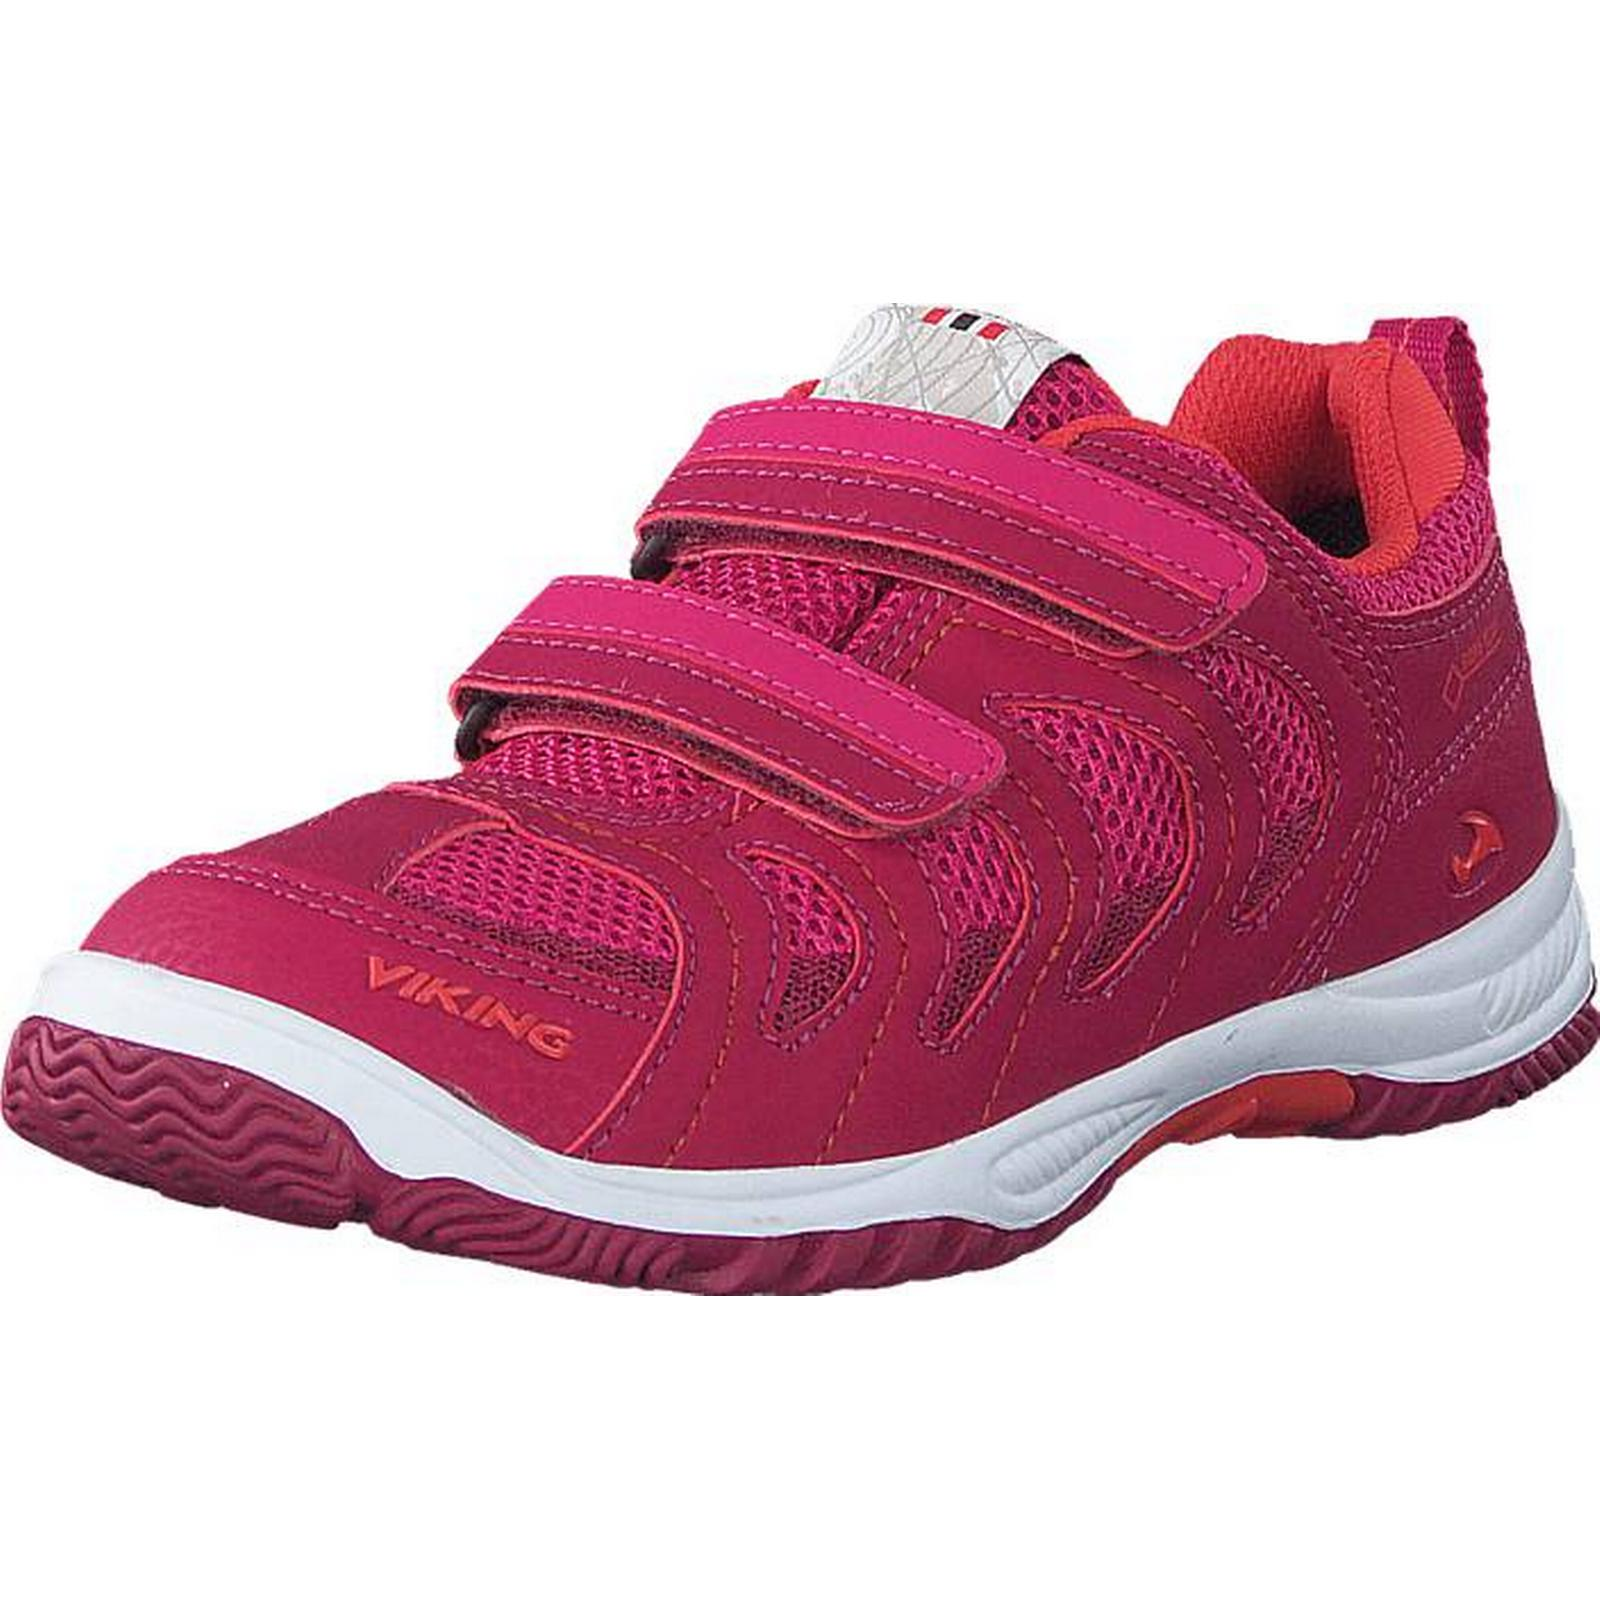 Viking Cascade II Gore-Tex® Fuchsia/Dark Pink, Pink, Fuchsia/Dark Shoes, Trainers & Sport Shoes , Walking Shoes, Pink, Unisex, 25 91f5df